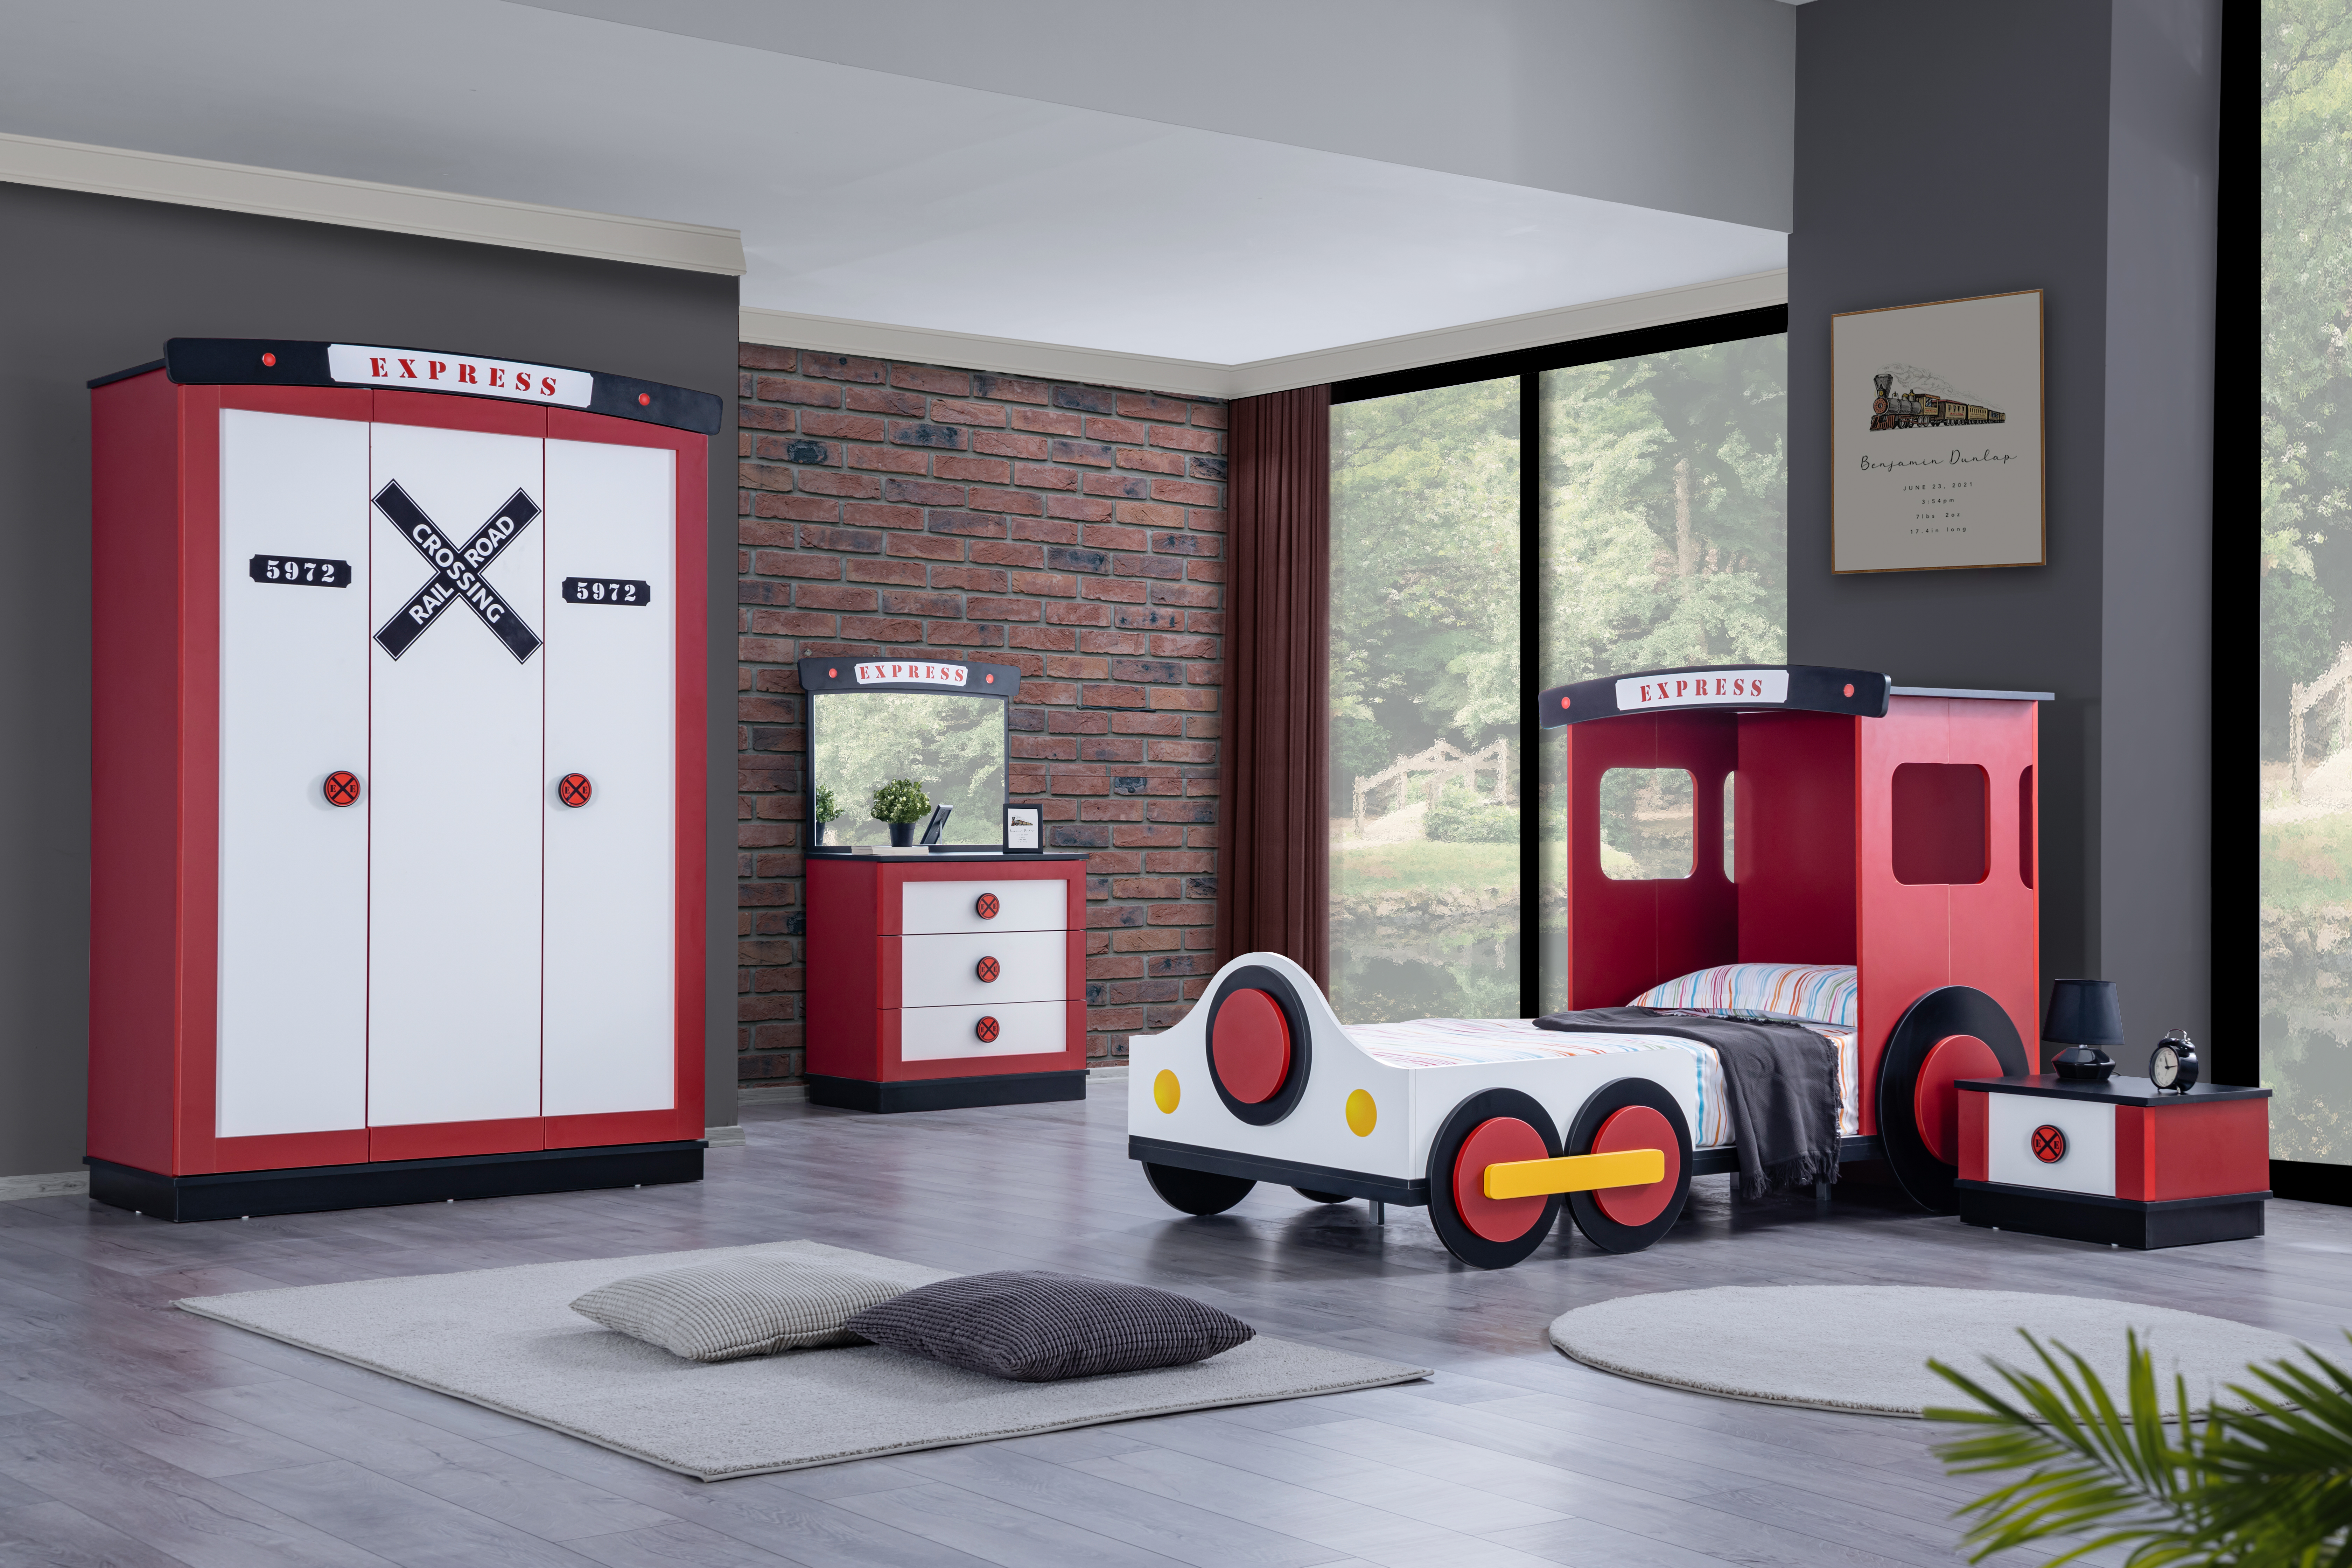 Odacix Kinderzimmer Express 4-teilig Lokomotiven Design